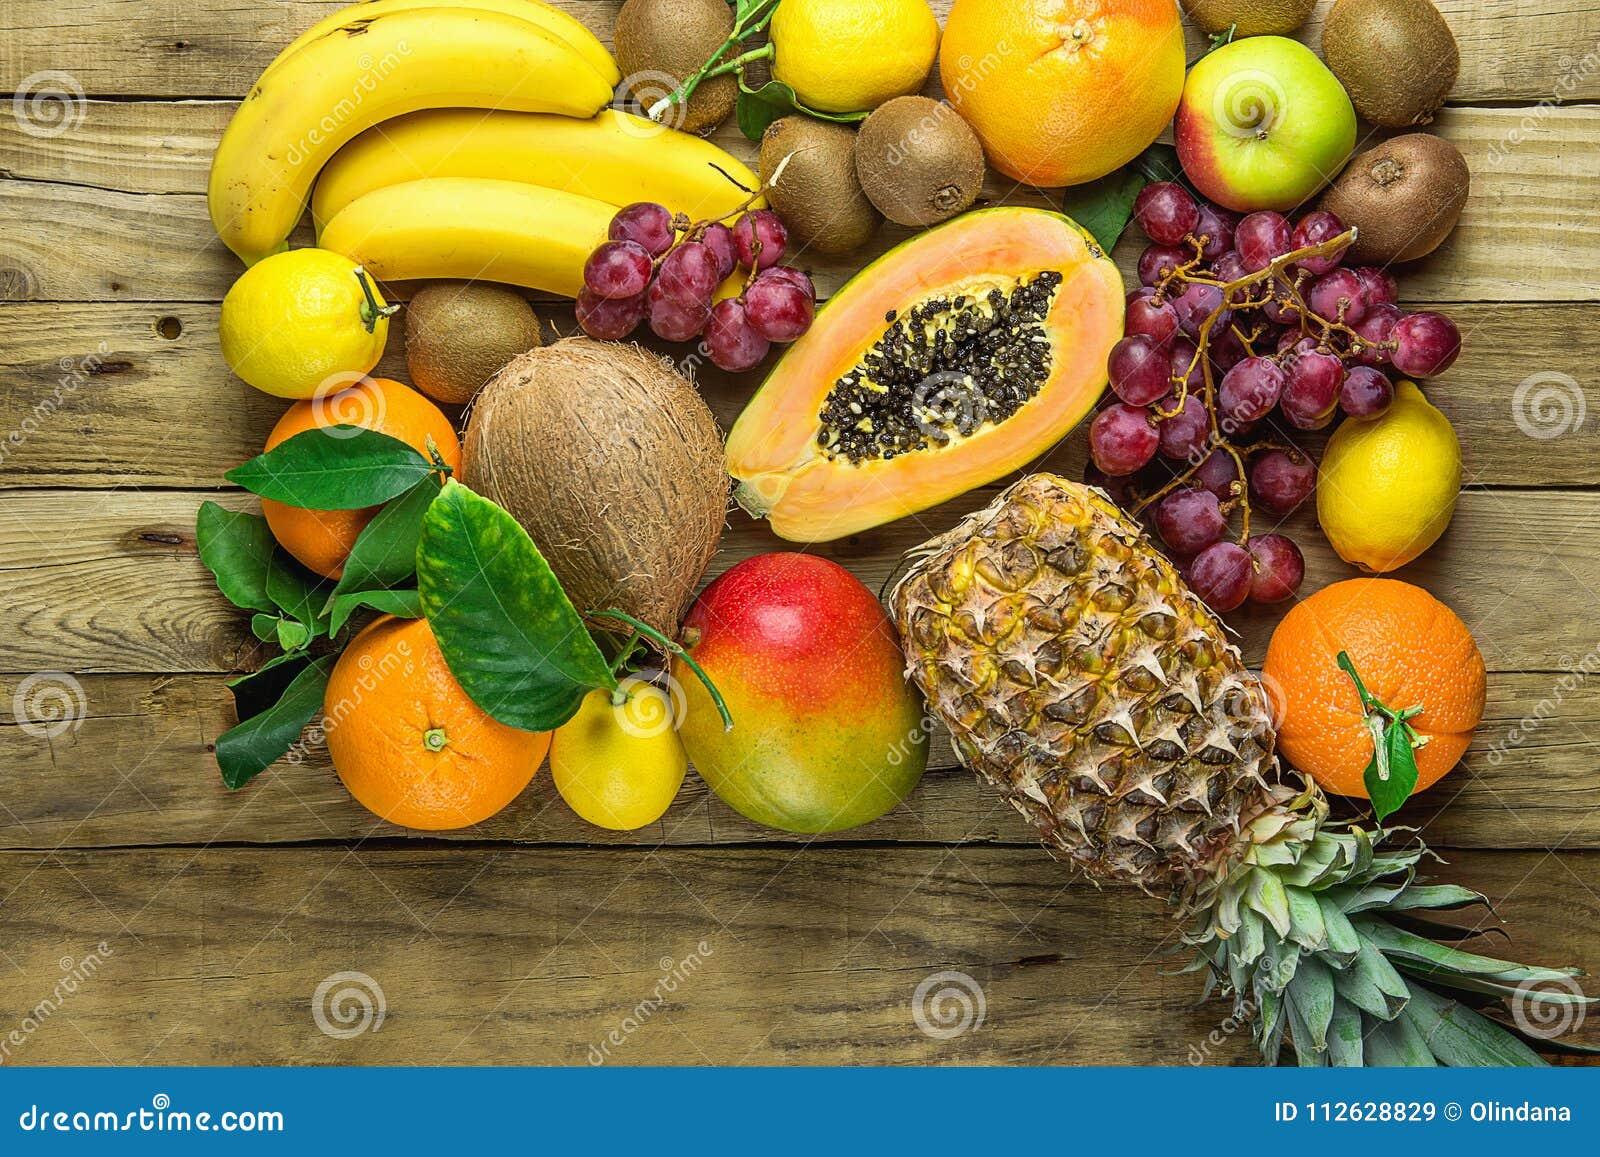 Variety Of Fresh Tropical And Summer Seasonal Fruits Pineapple Papaya Mango Coconut Oranges Kiwi Bananas Lemons Grapefruit On Wood Stock Image Image Of Apples Fruits 112628829